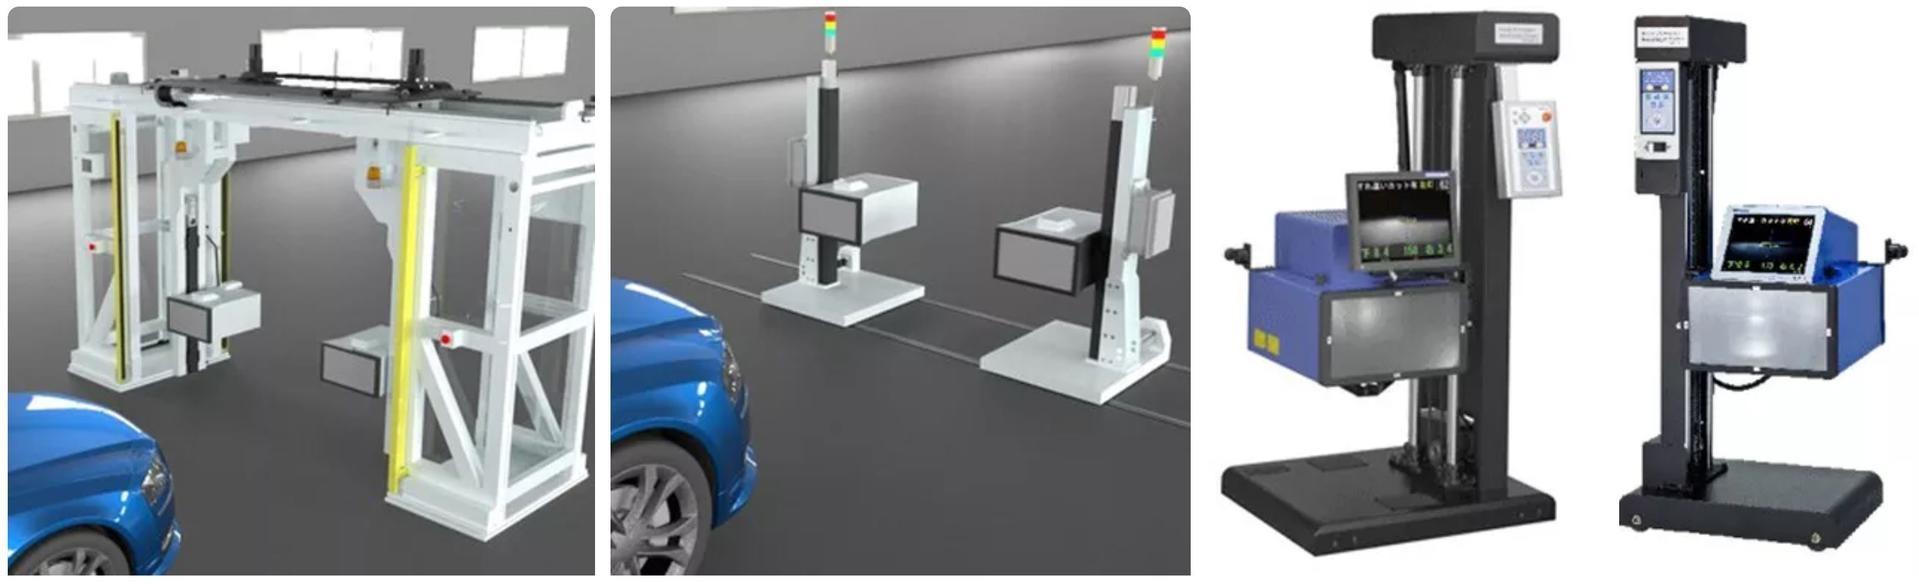 Setup images for production line and audit station